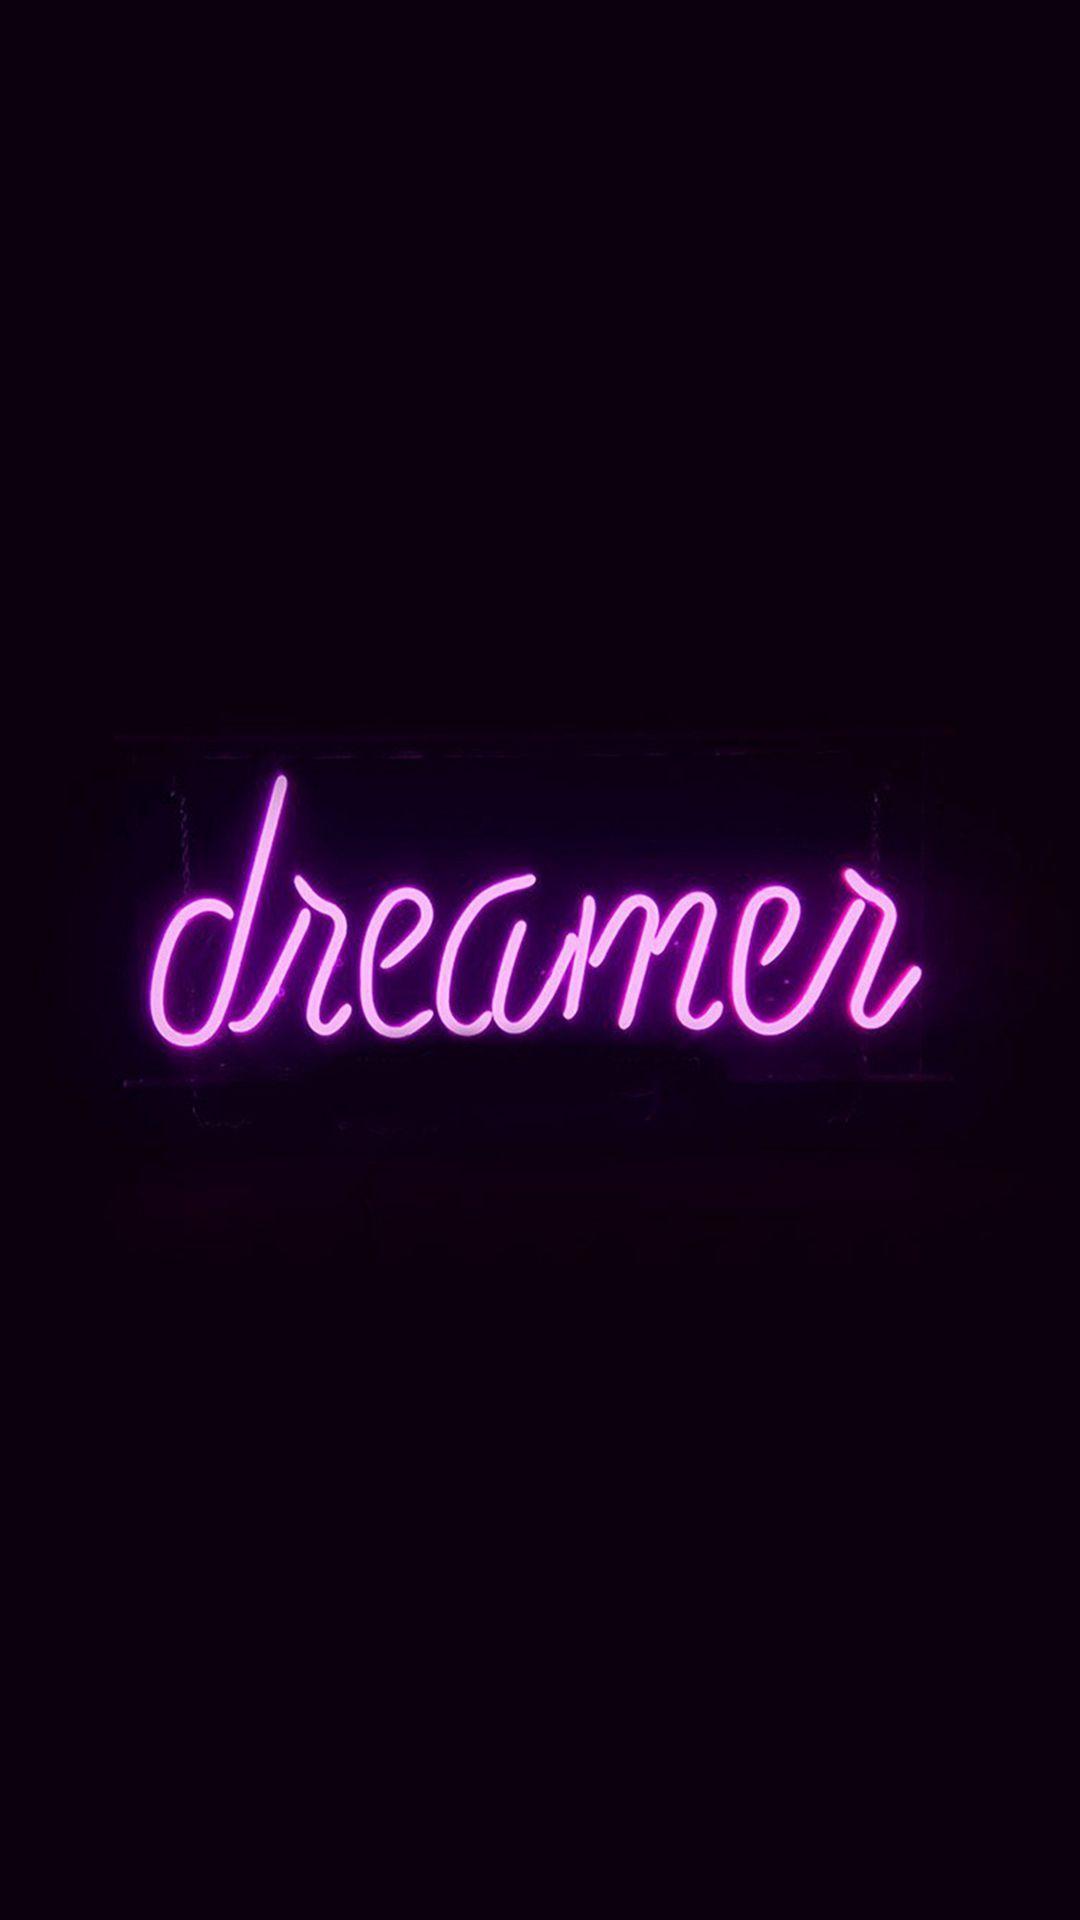 Dreamers Neon Sign Dark Illustration Art Purple Iphone  Wallpaper